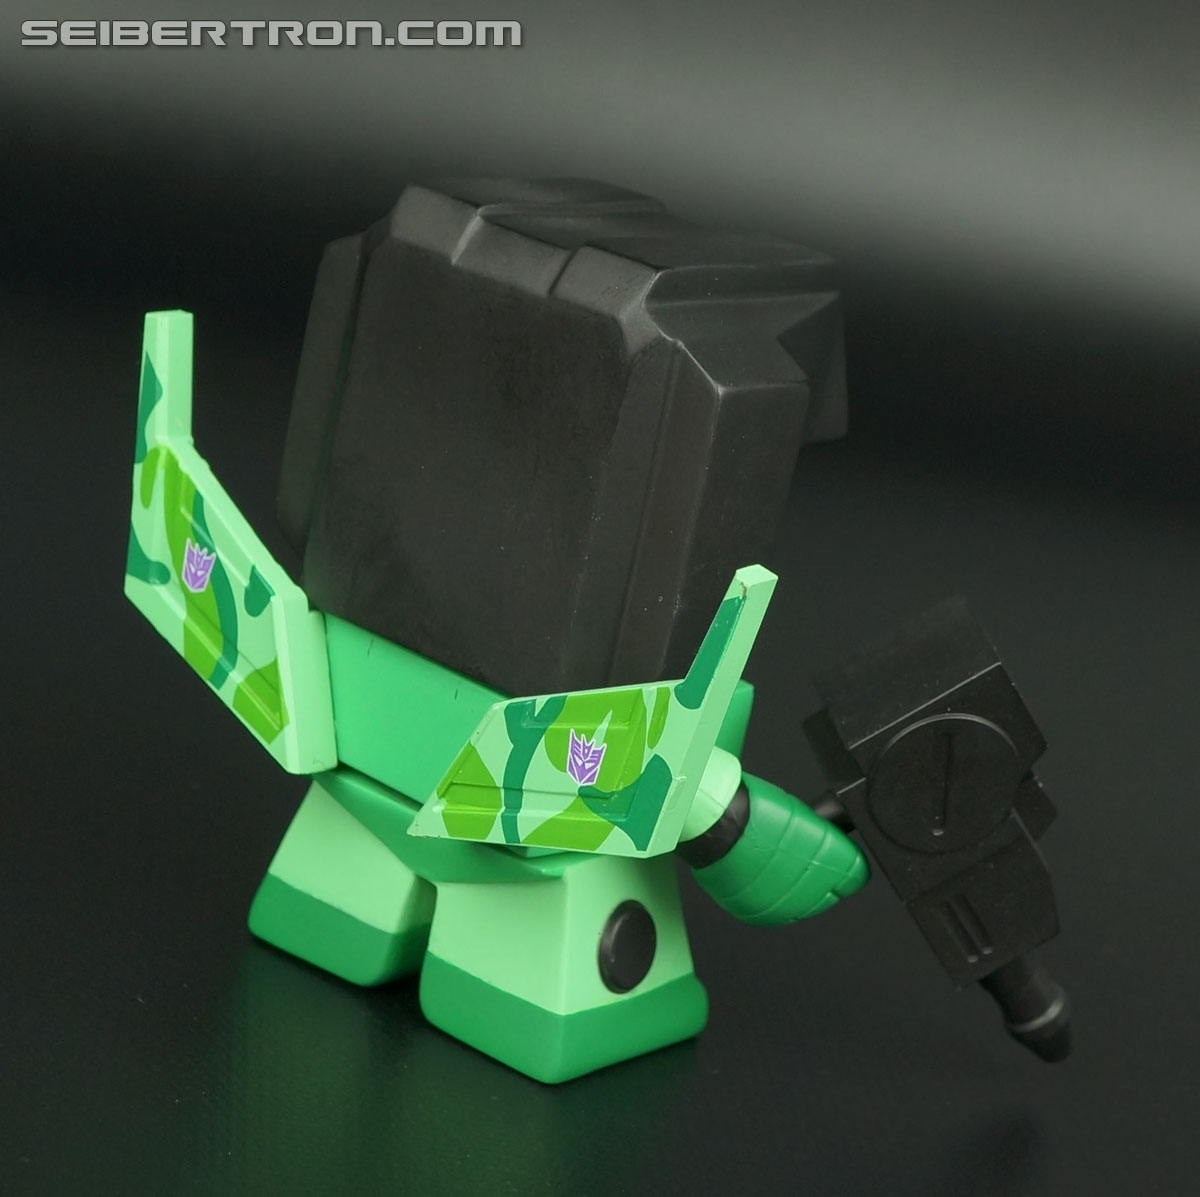 Transformers Loyal Subjects Rainmaker (Green) (Acid Storm) (Image #19 of 40)